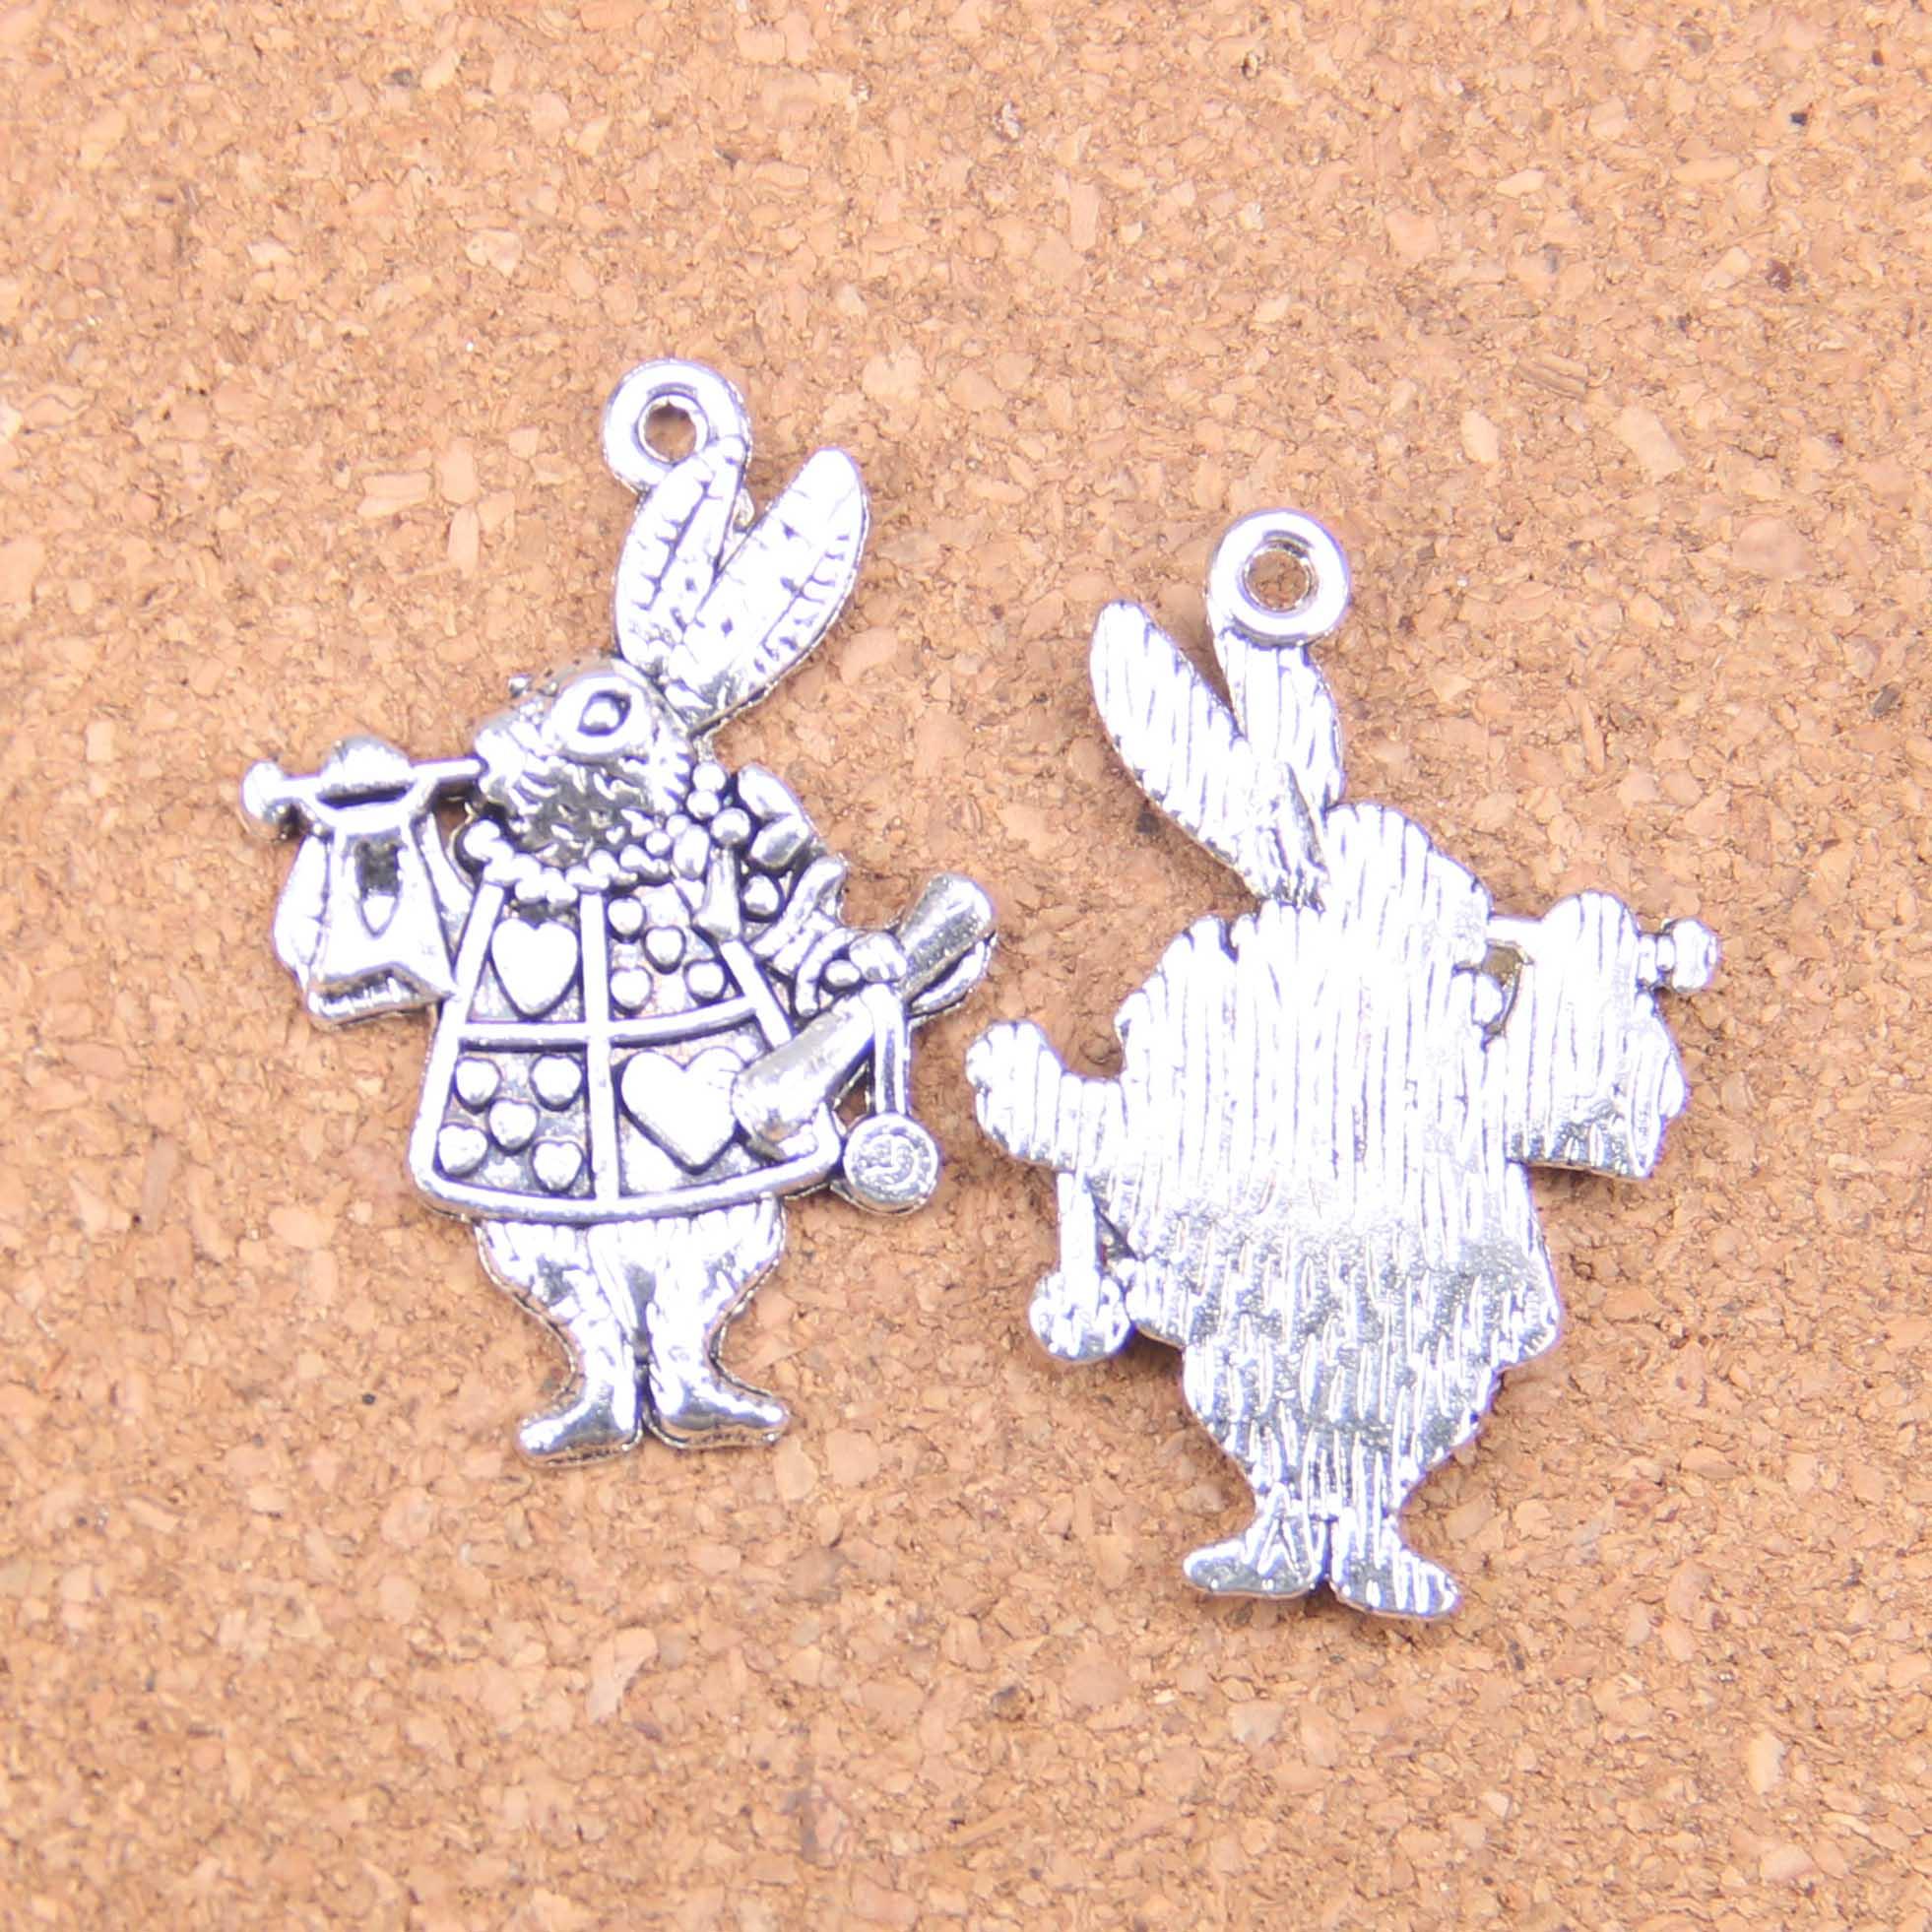 Spirited 26pcs Charms Musical Rabbit Trumpet 36x23mm Antique Pendants,vintage Tibetan Silver Jewelry,diy For Bracelet Necklace